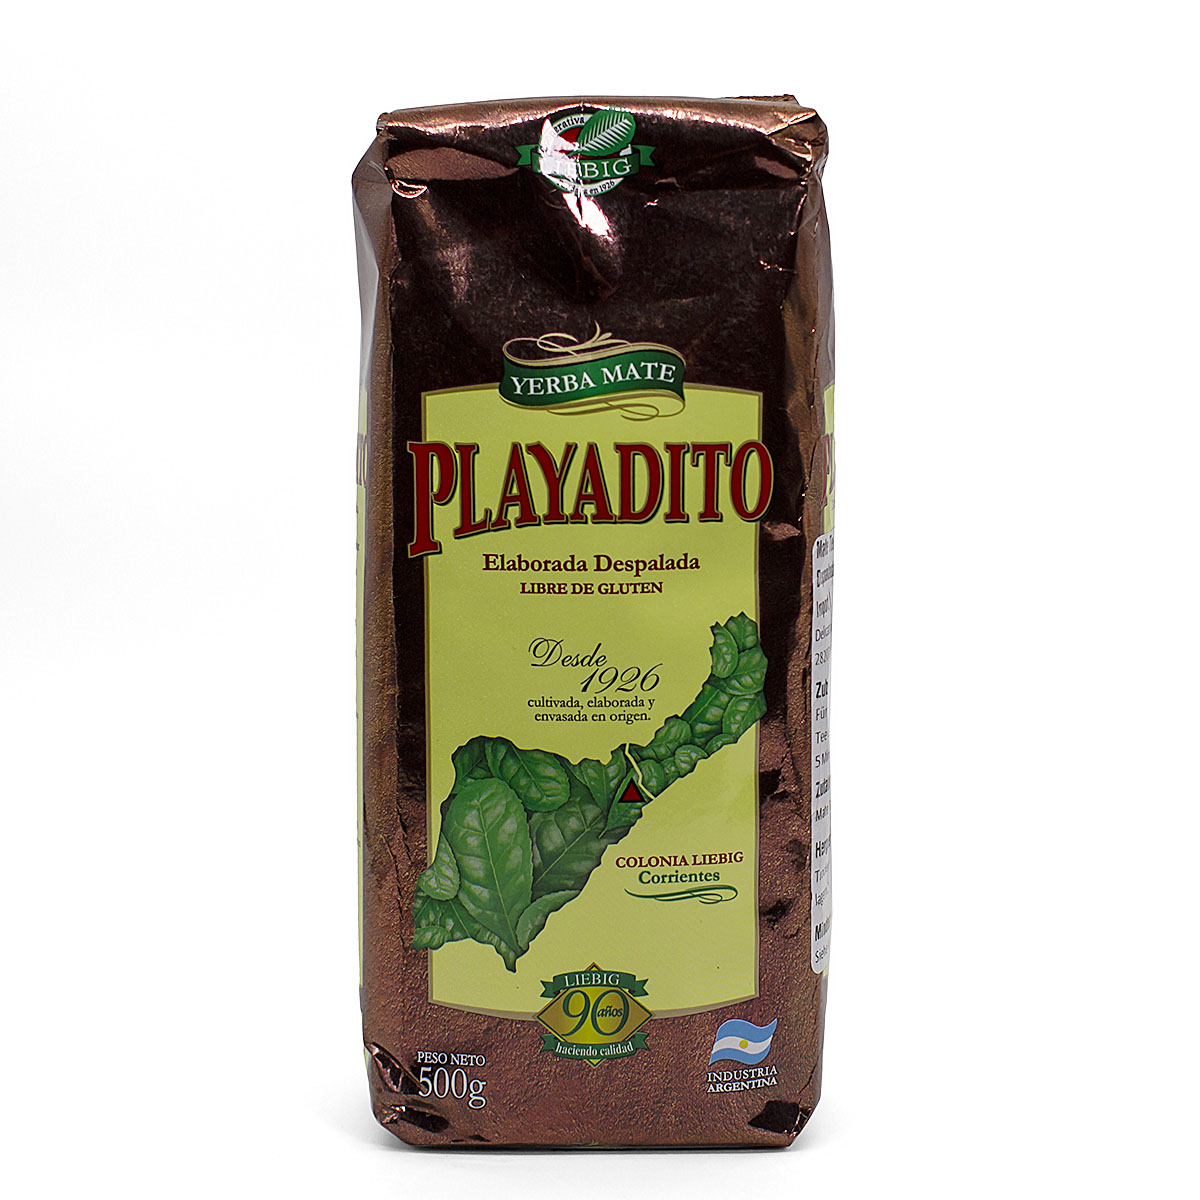 Мате Playadito Despalada, 500 г чай мате yerba mate playadito листовой 1000 г